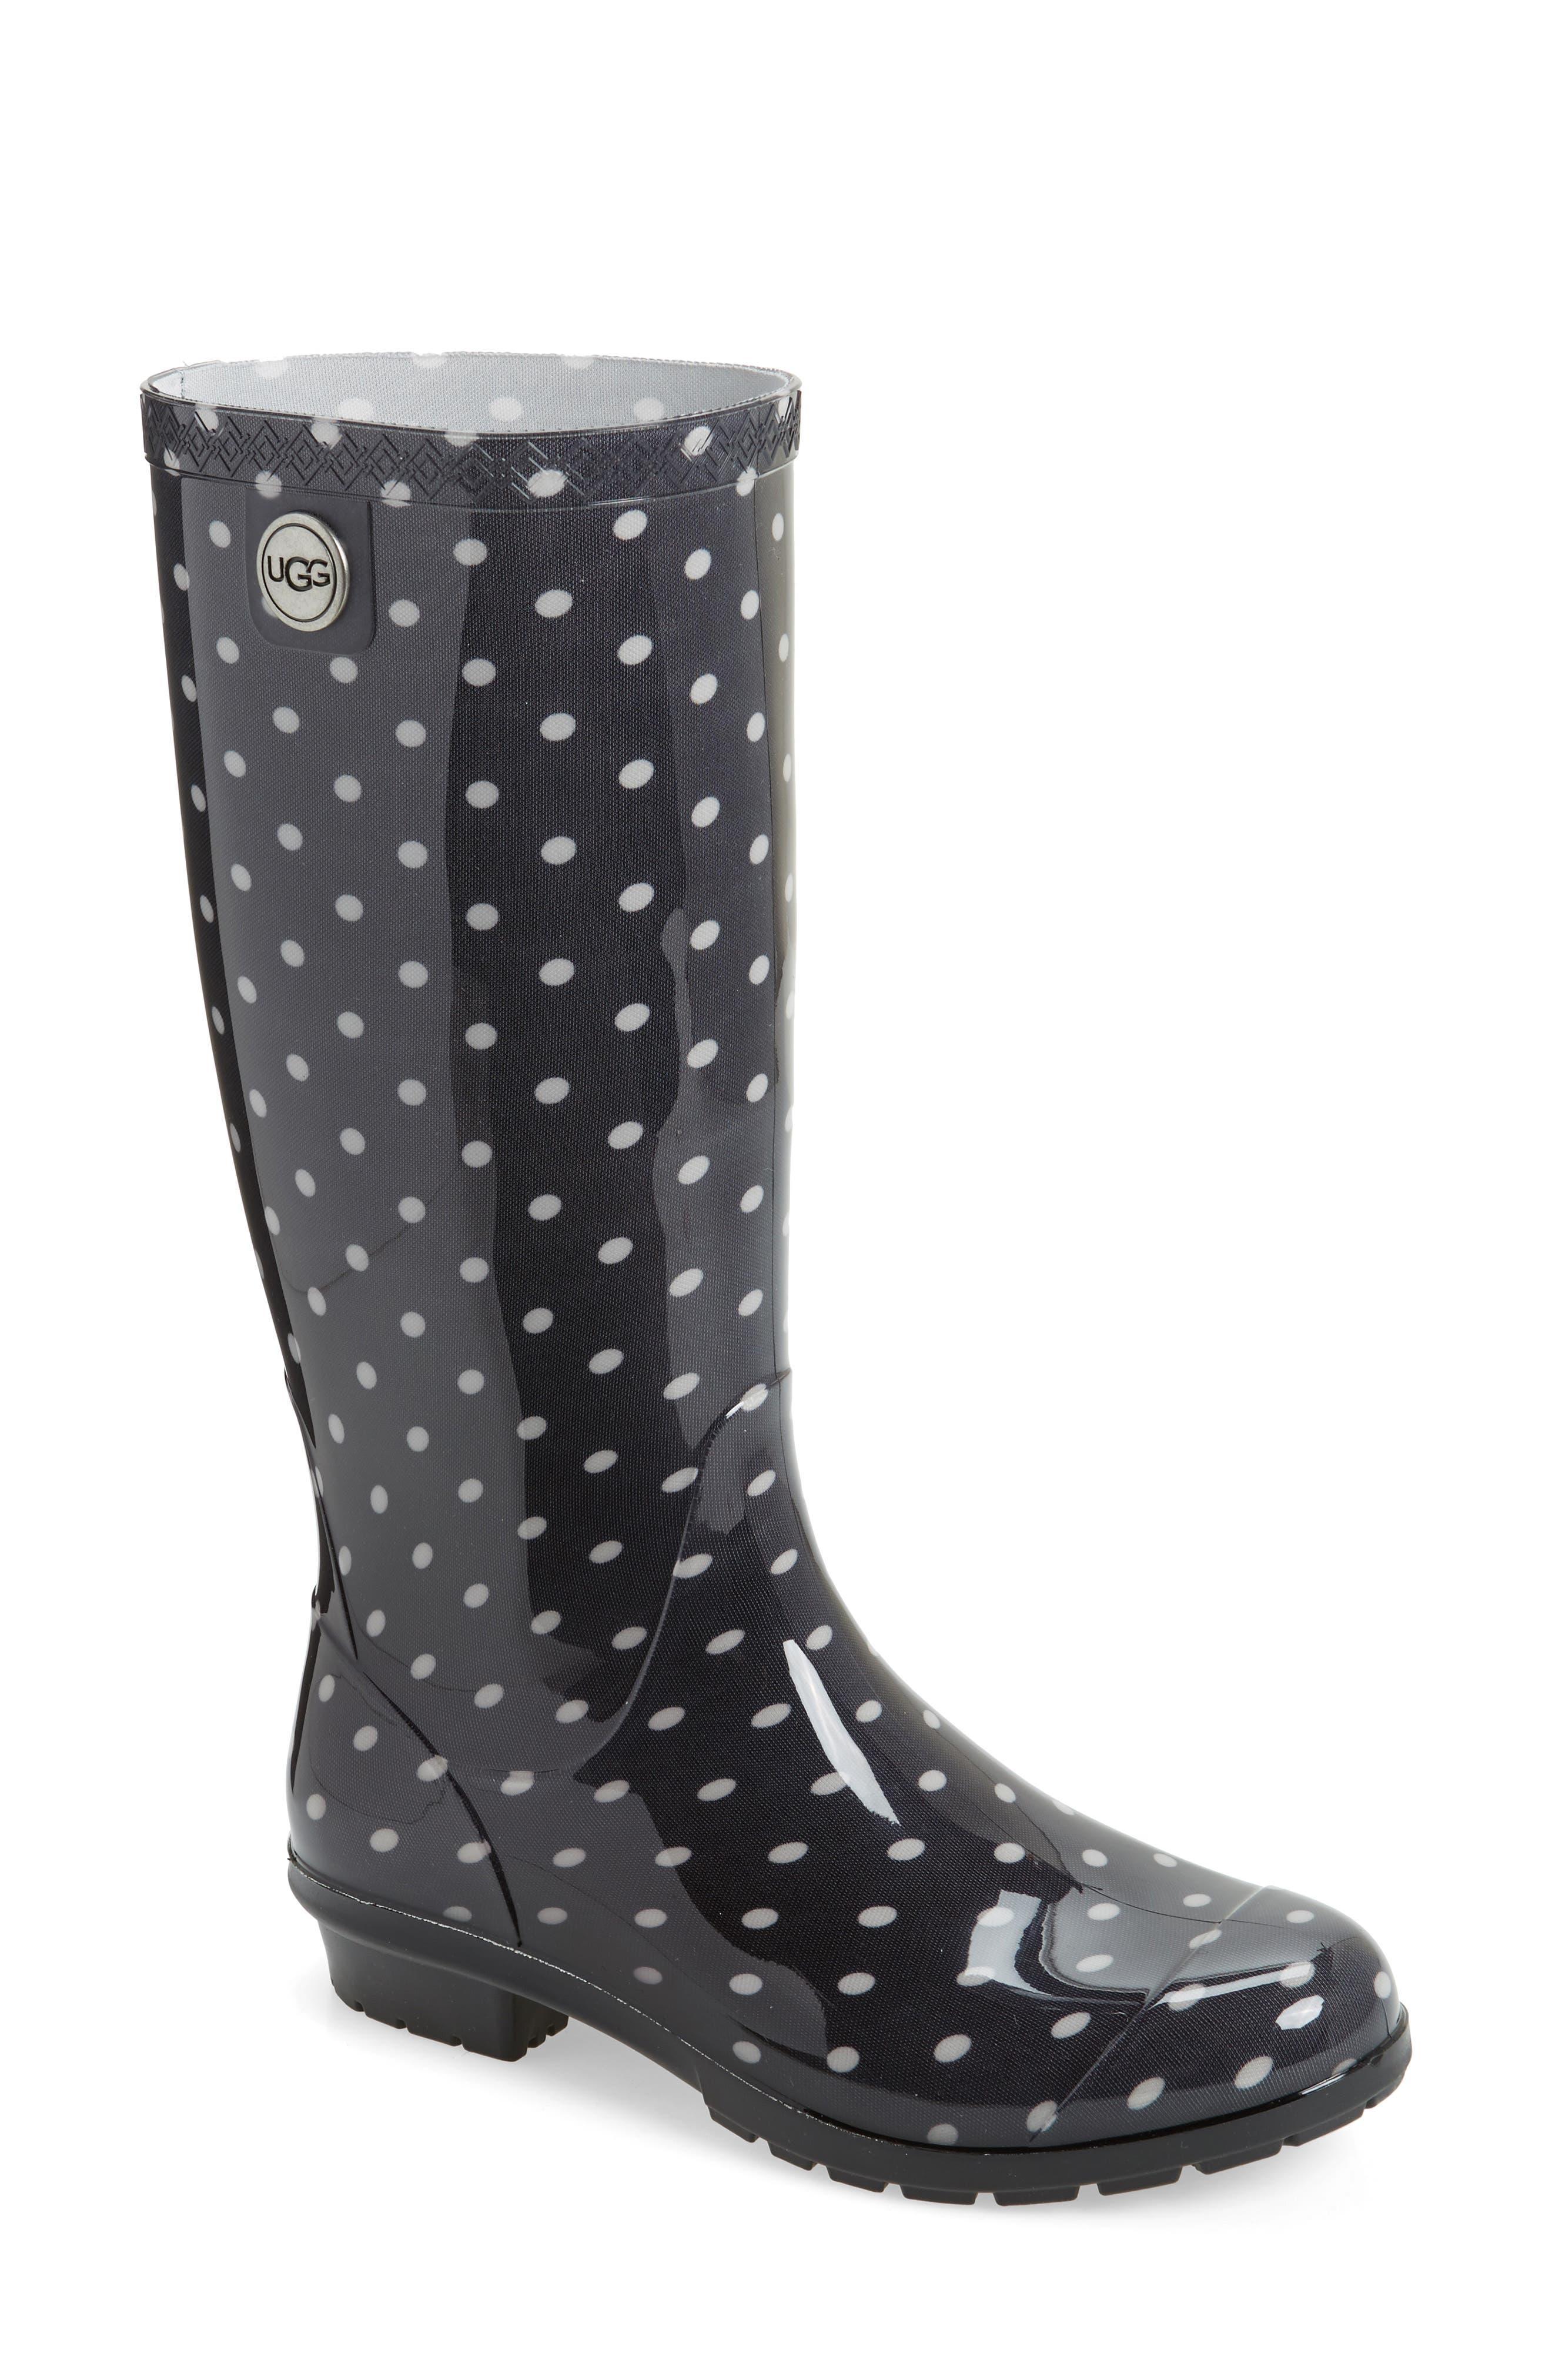 Shaye Polka Dot Rain Boot,                         Main,                         color, Black/ White